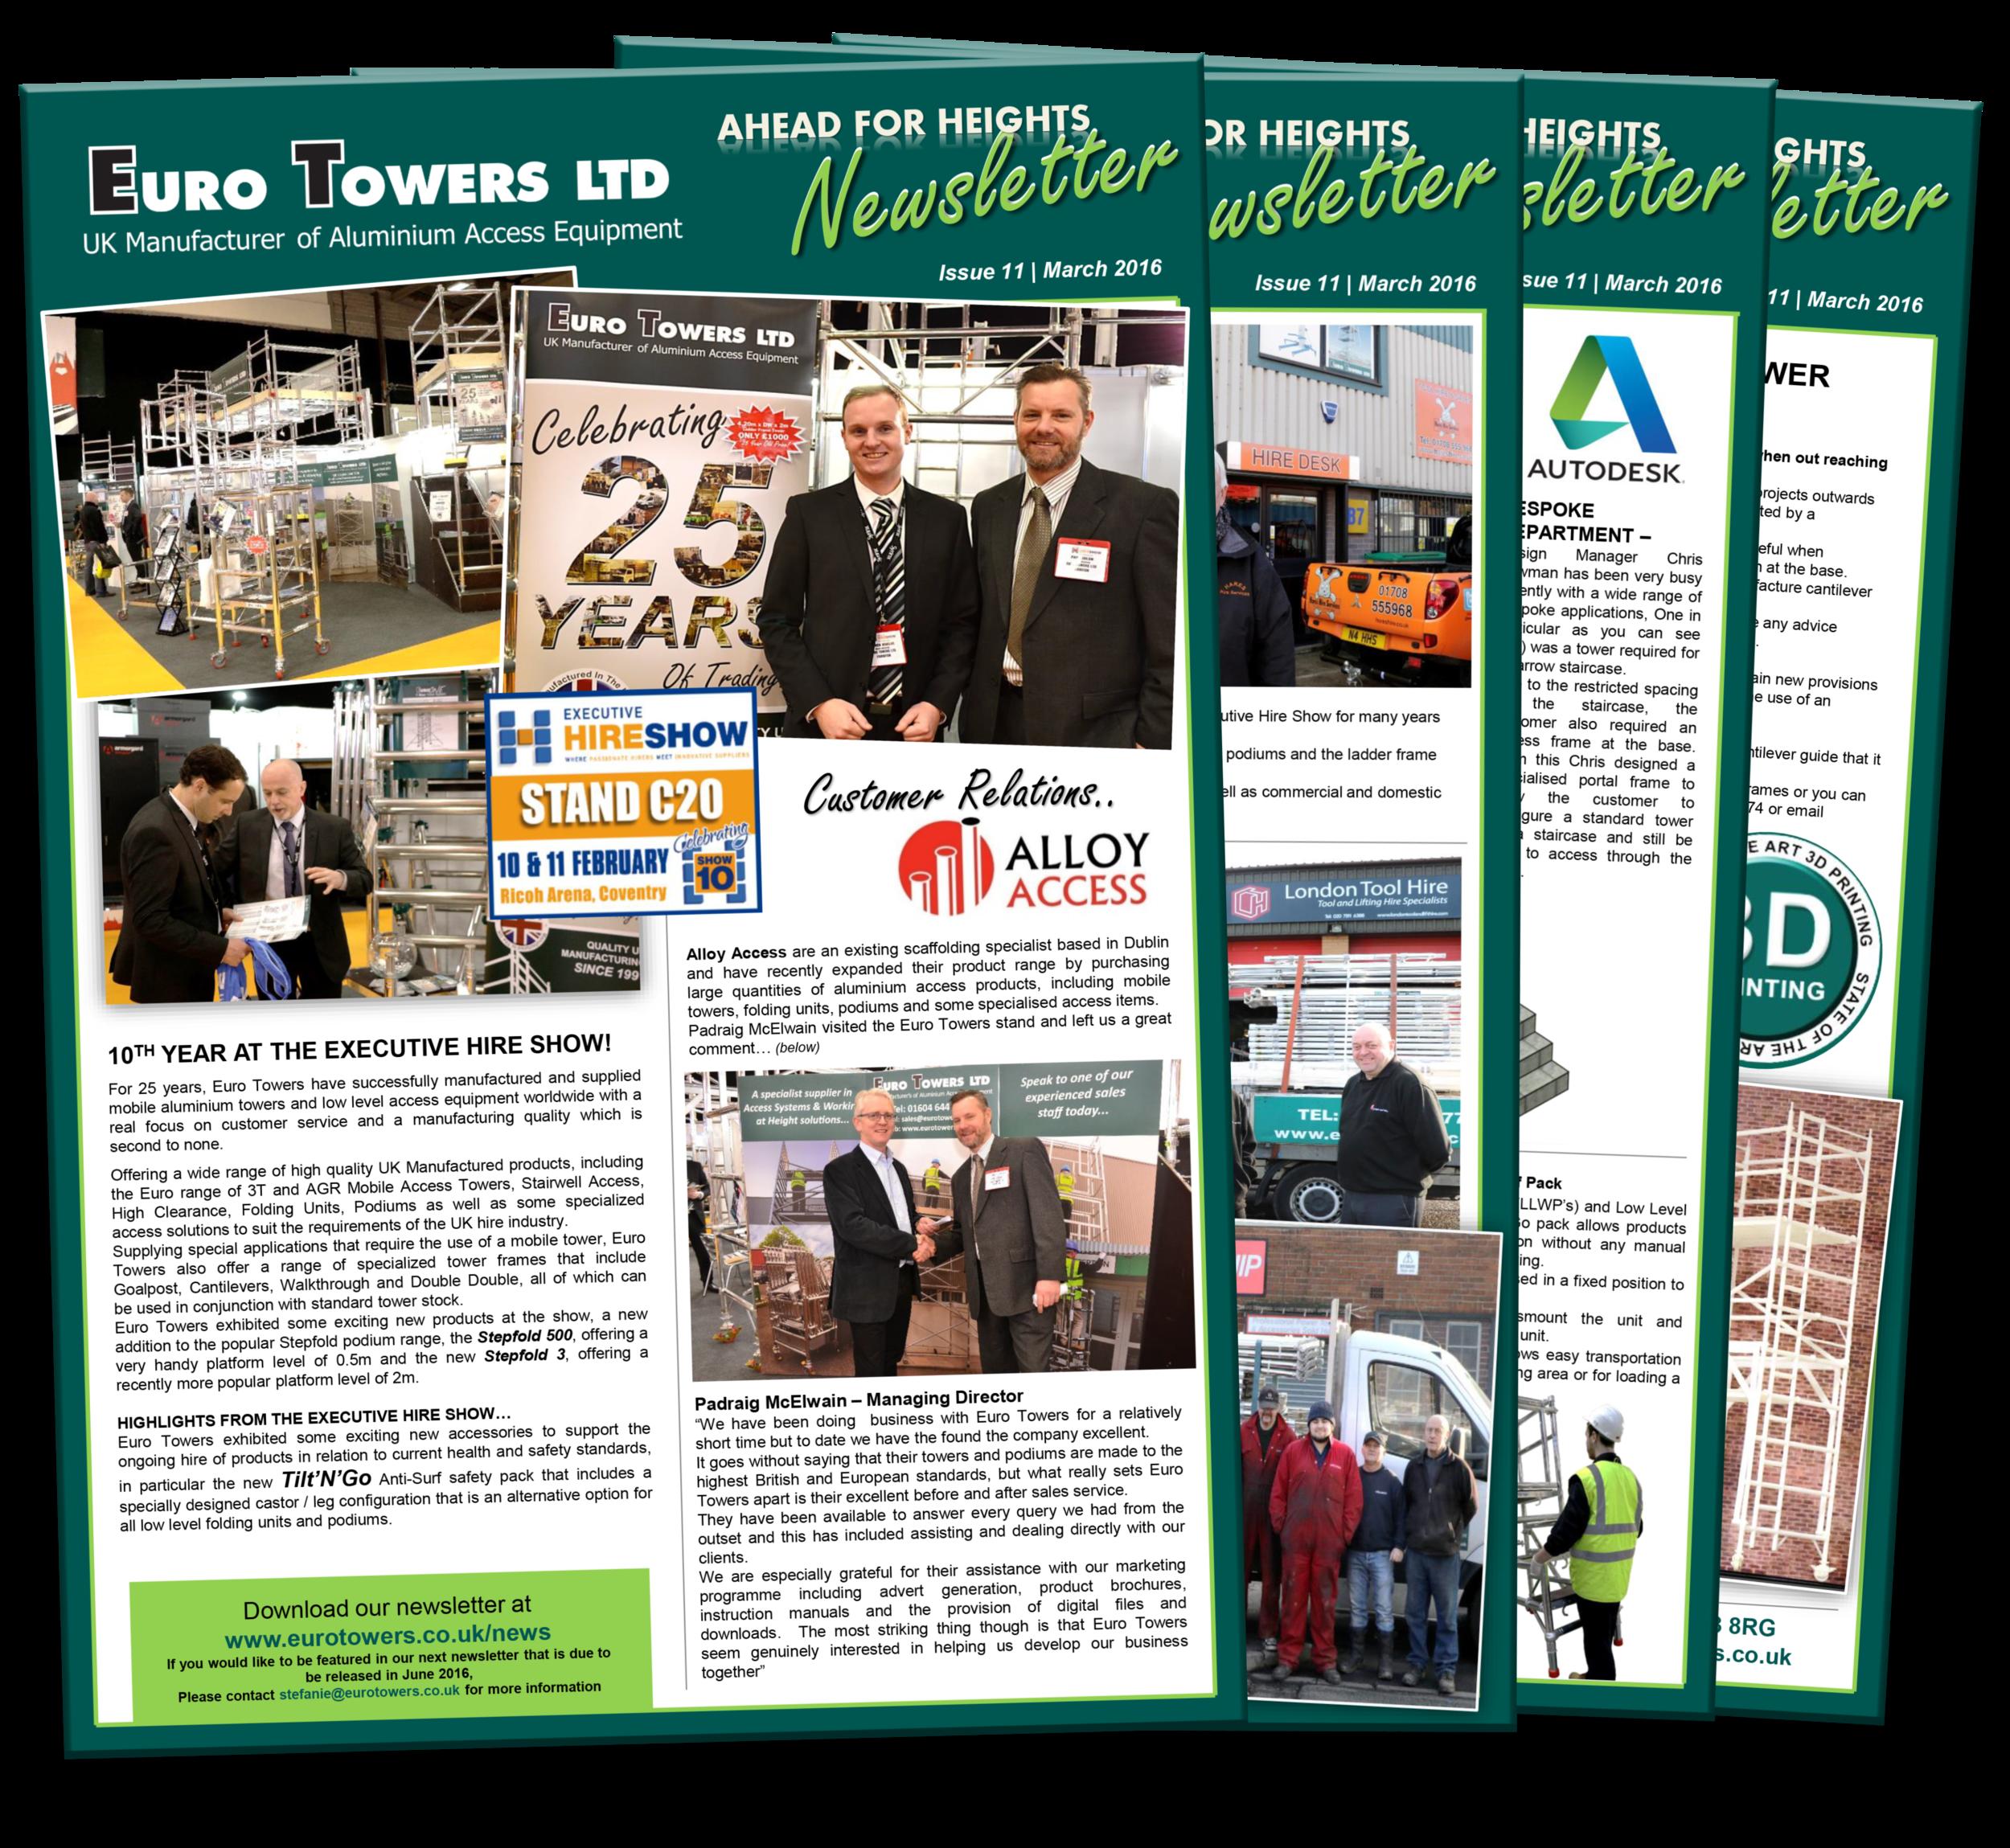 euro towers newsletter | aluminium tower suppliers | aluminium podium | executive hire show | 3D pritning |